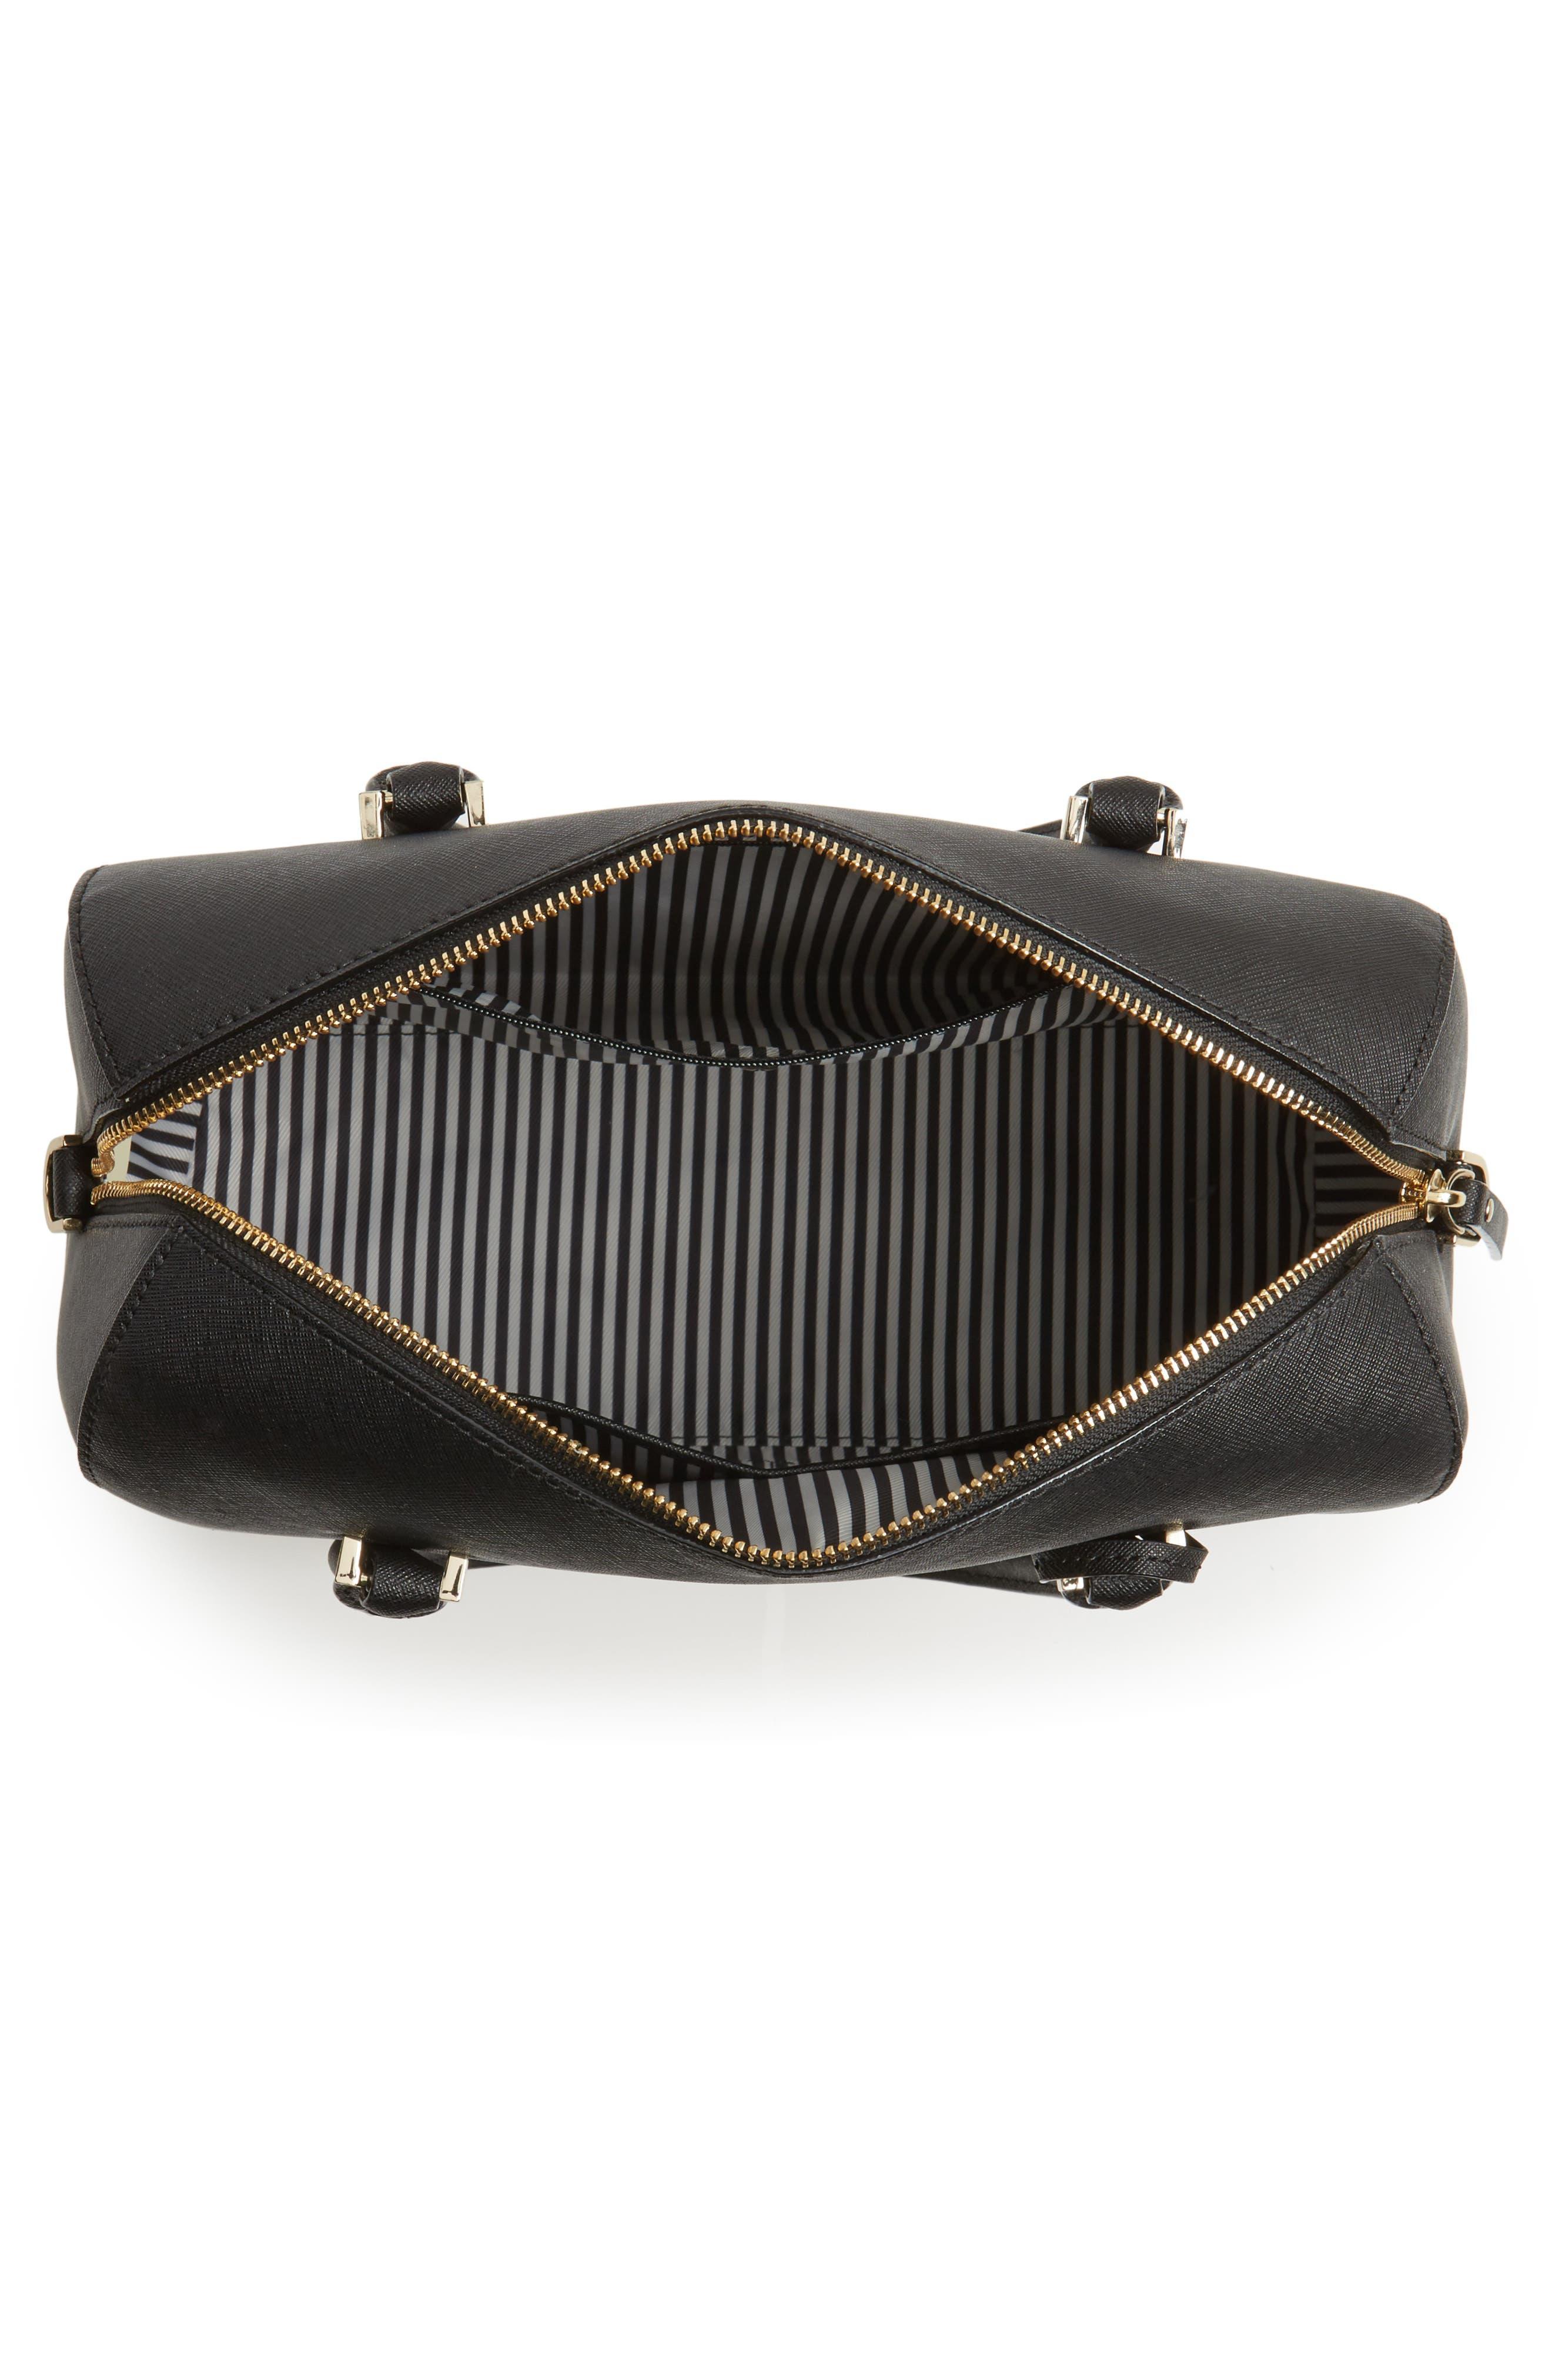 mega cameron street - lane leather satchel,                             Alternate thumbnail 3, color,                             Black